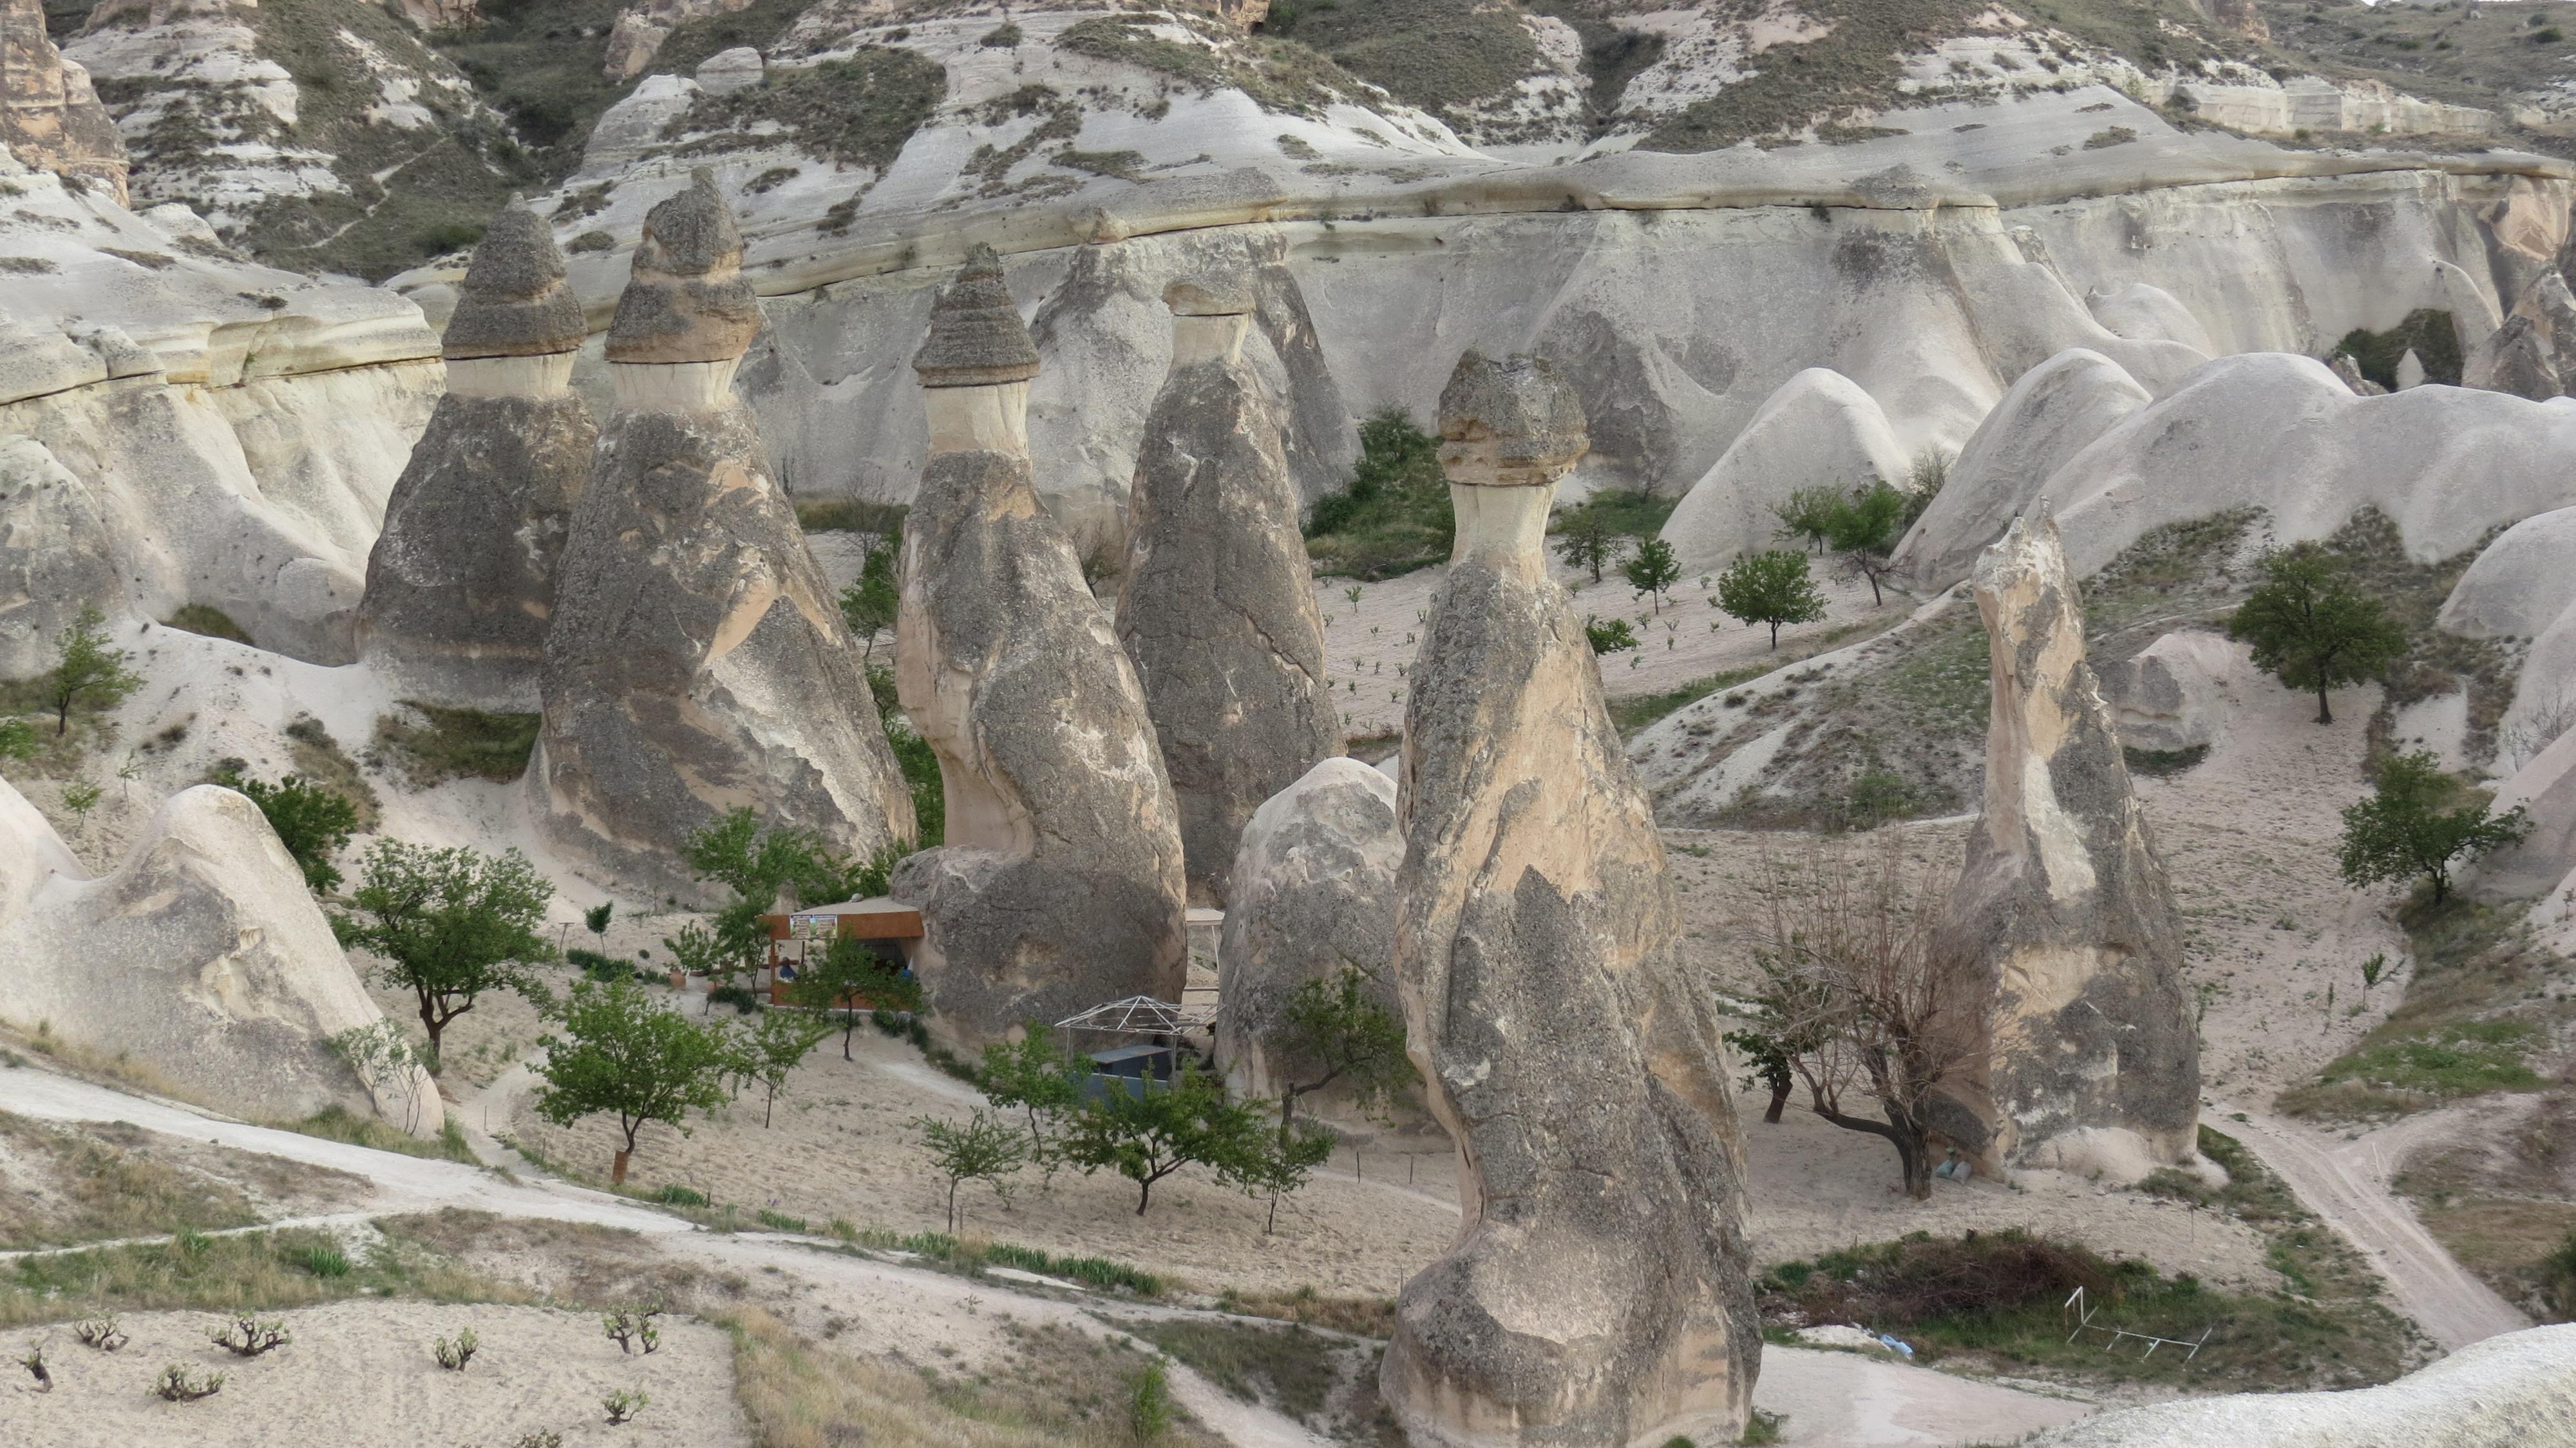 Luca Errera, Daniela Trastulli, Turchia, Cappadocia, camini delle fate